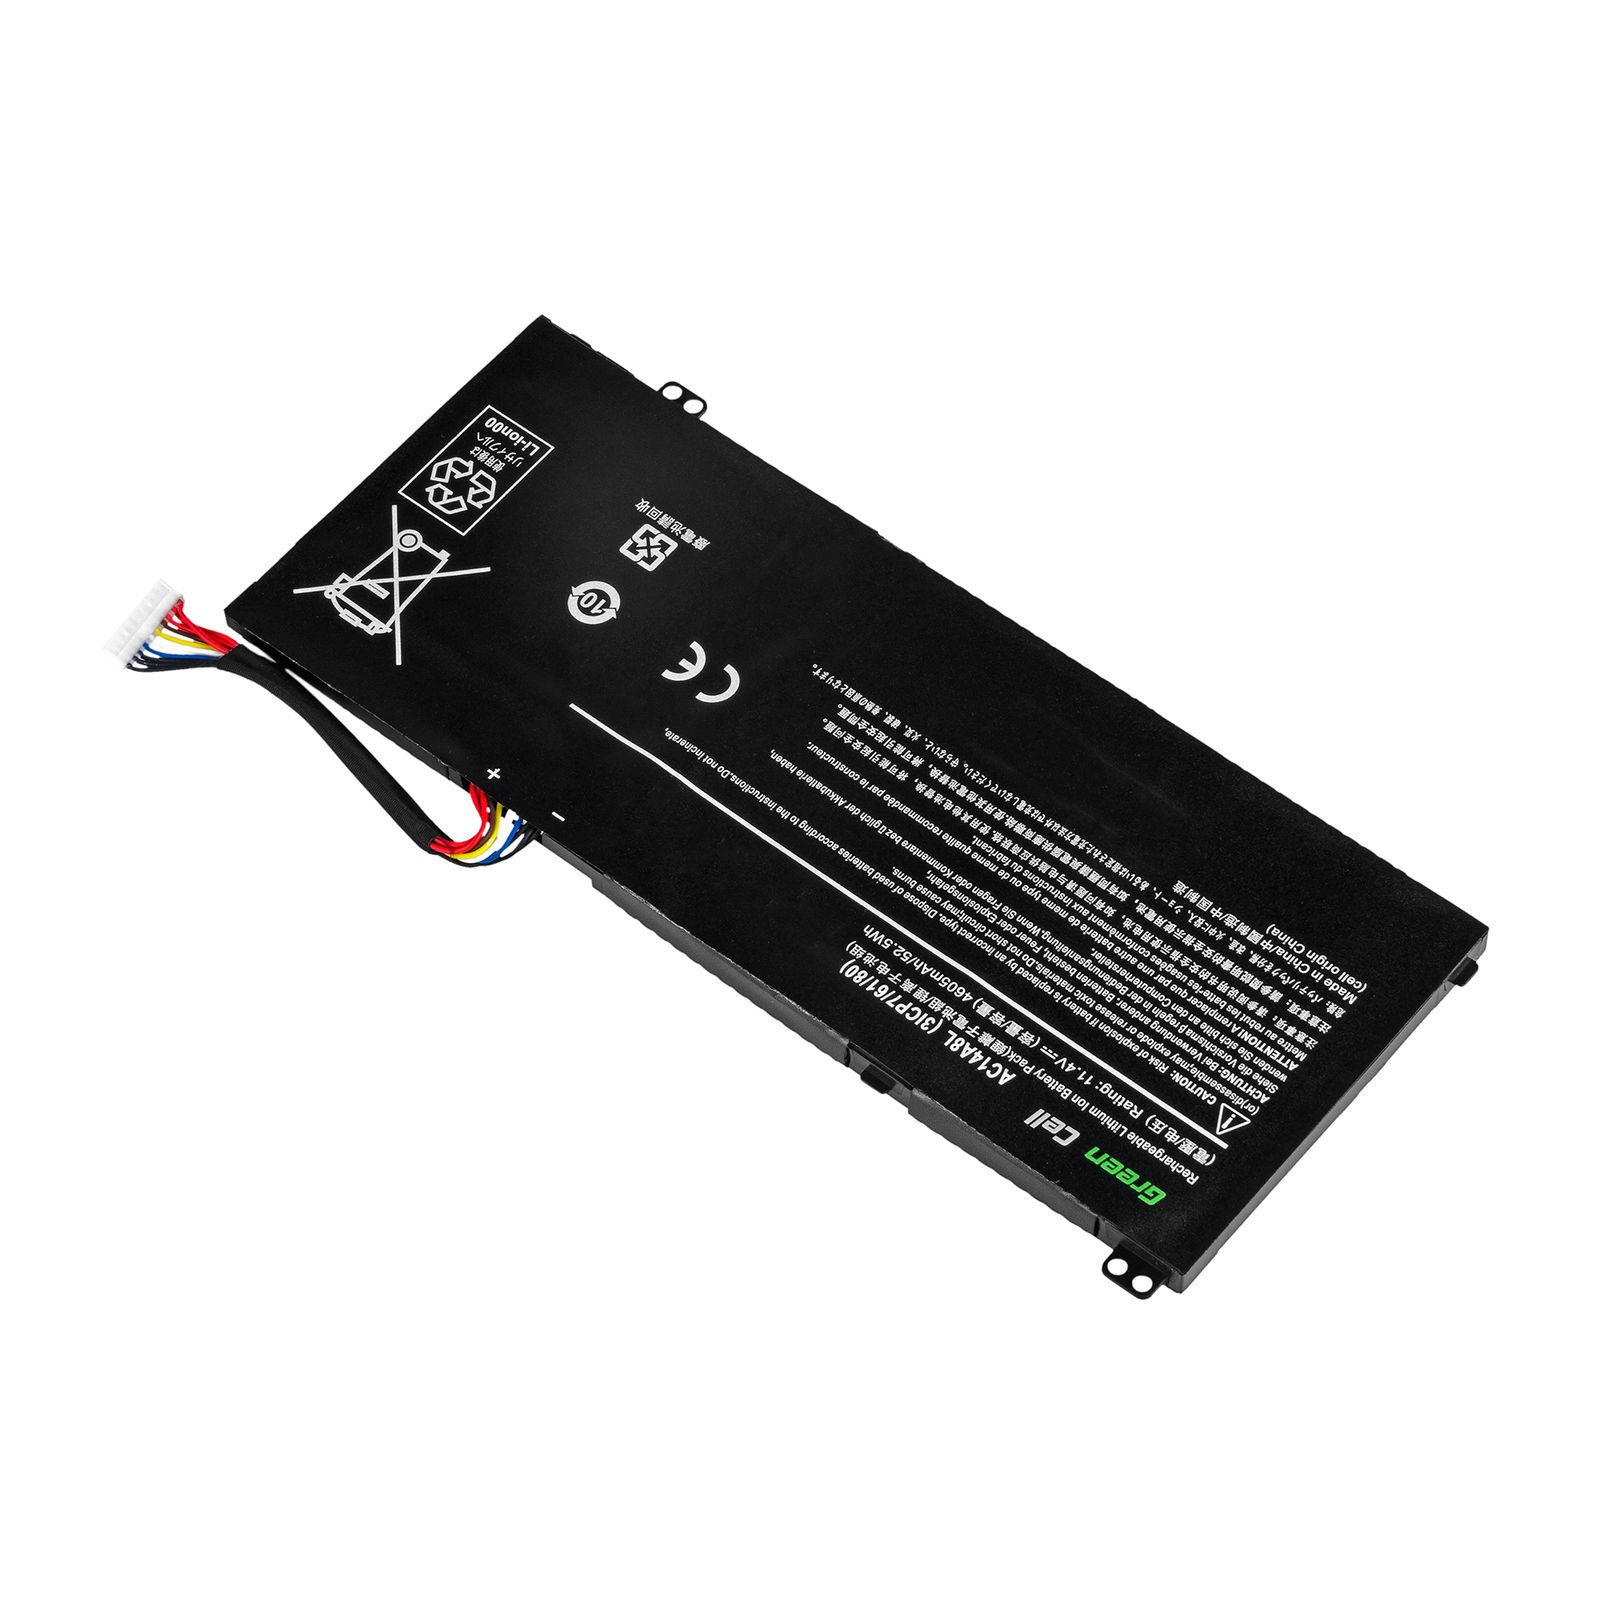 Acer Aspire VN7-571 VN7-572G VN7-591G VN7-591G VN7-791G VN7-792 compatibele Accu